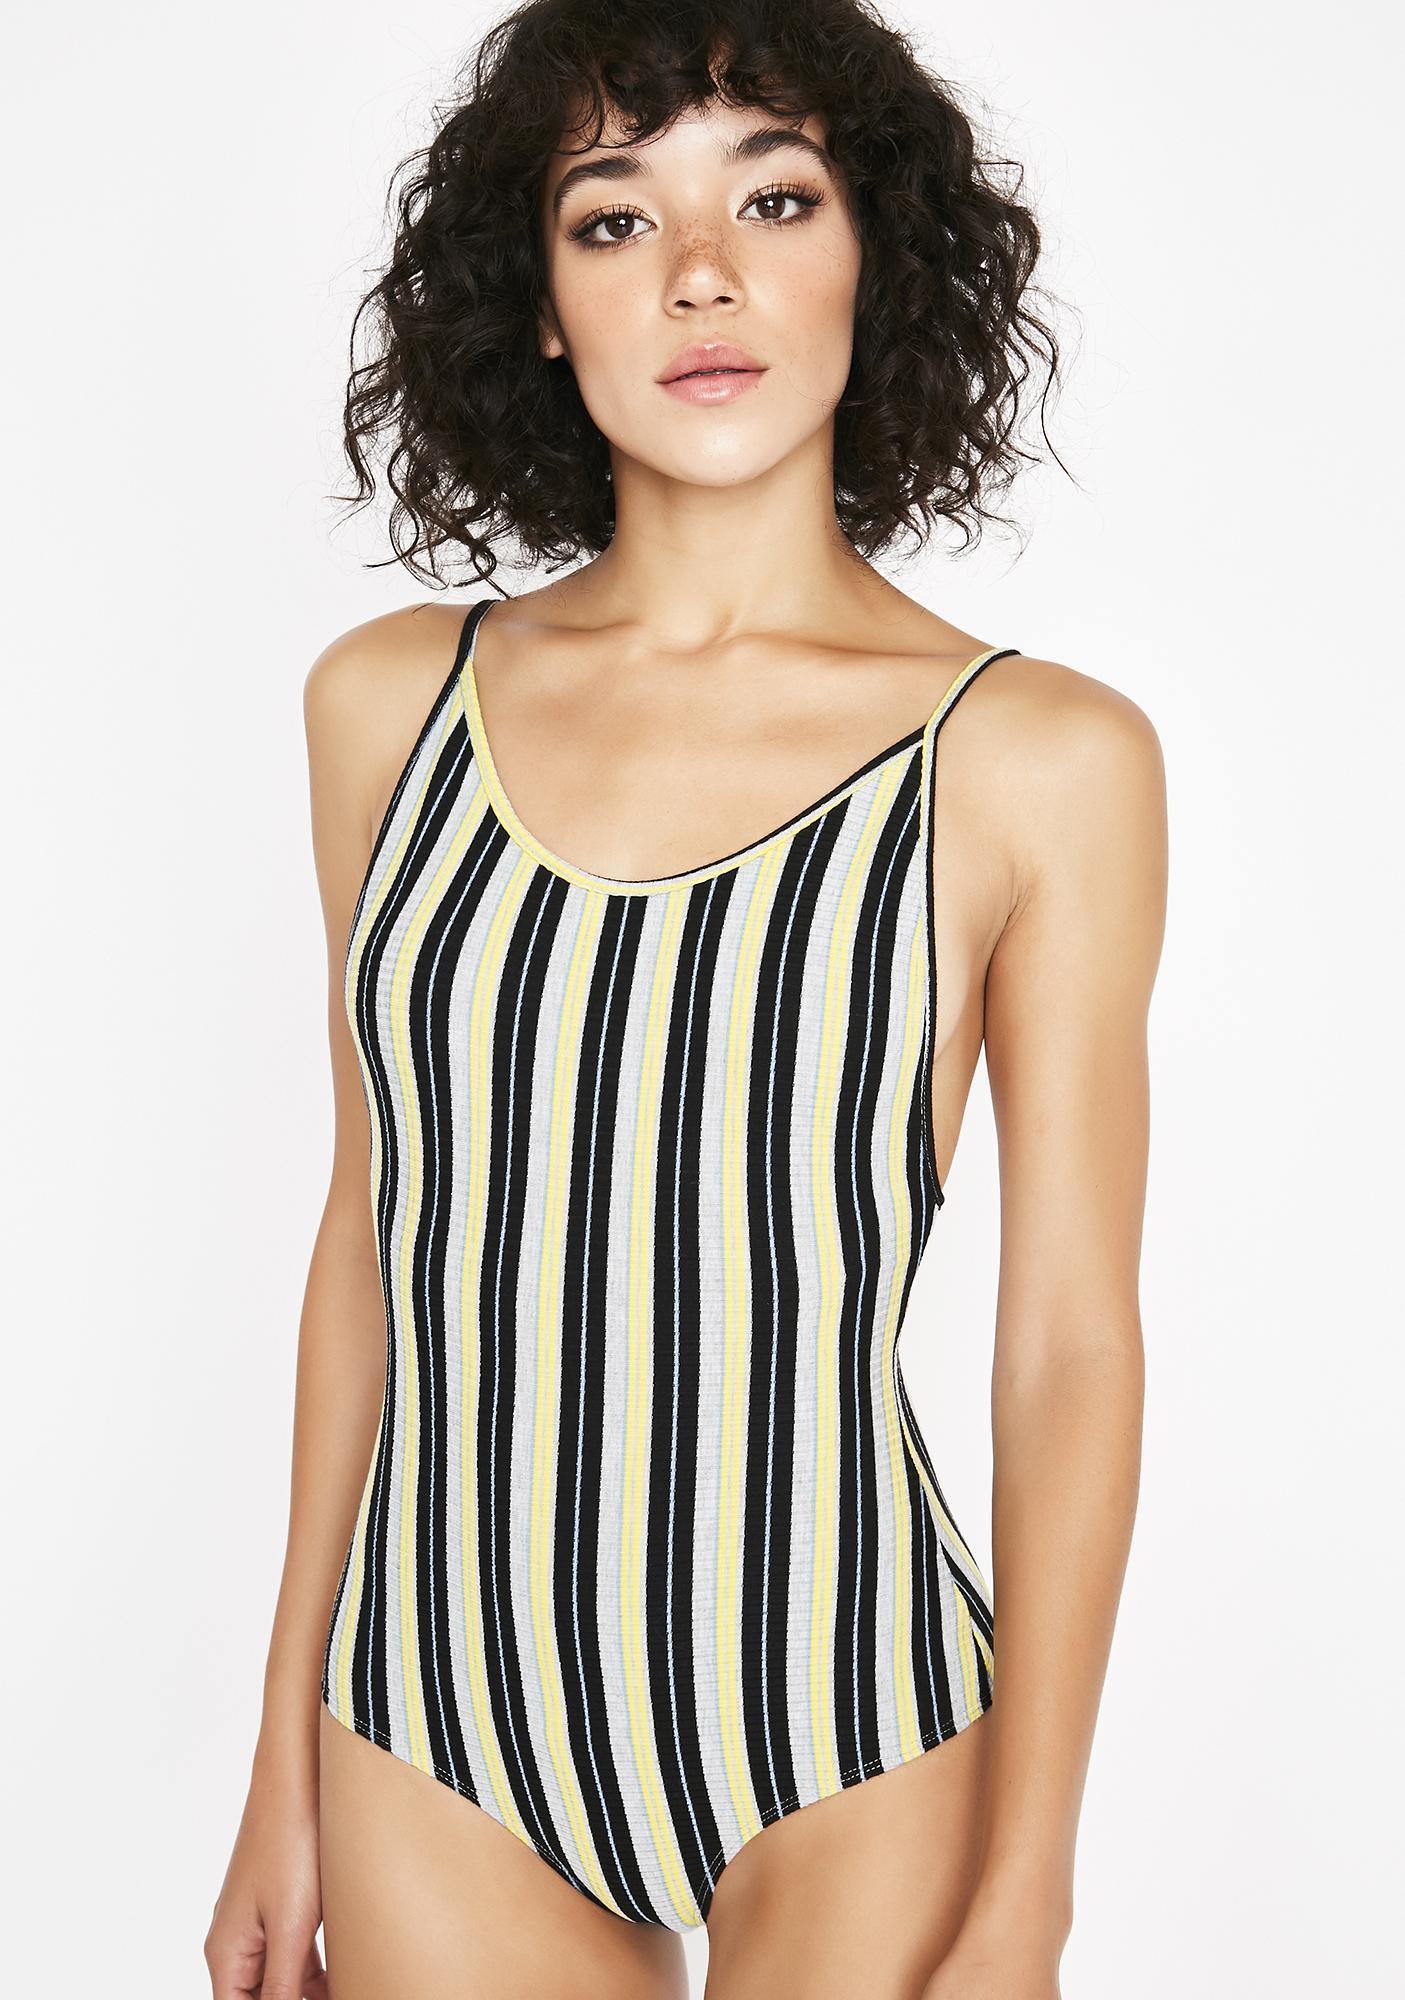 Dark Get Into Trouble Striped Bodysuit